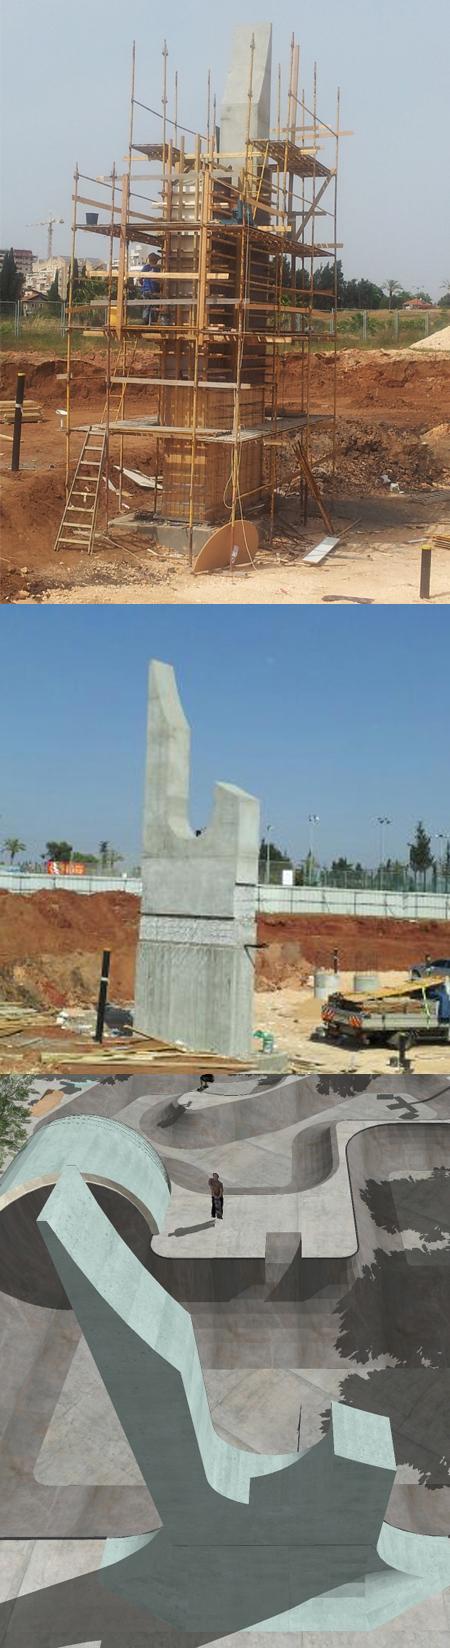 Israel Construction